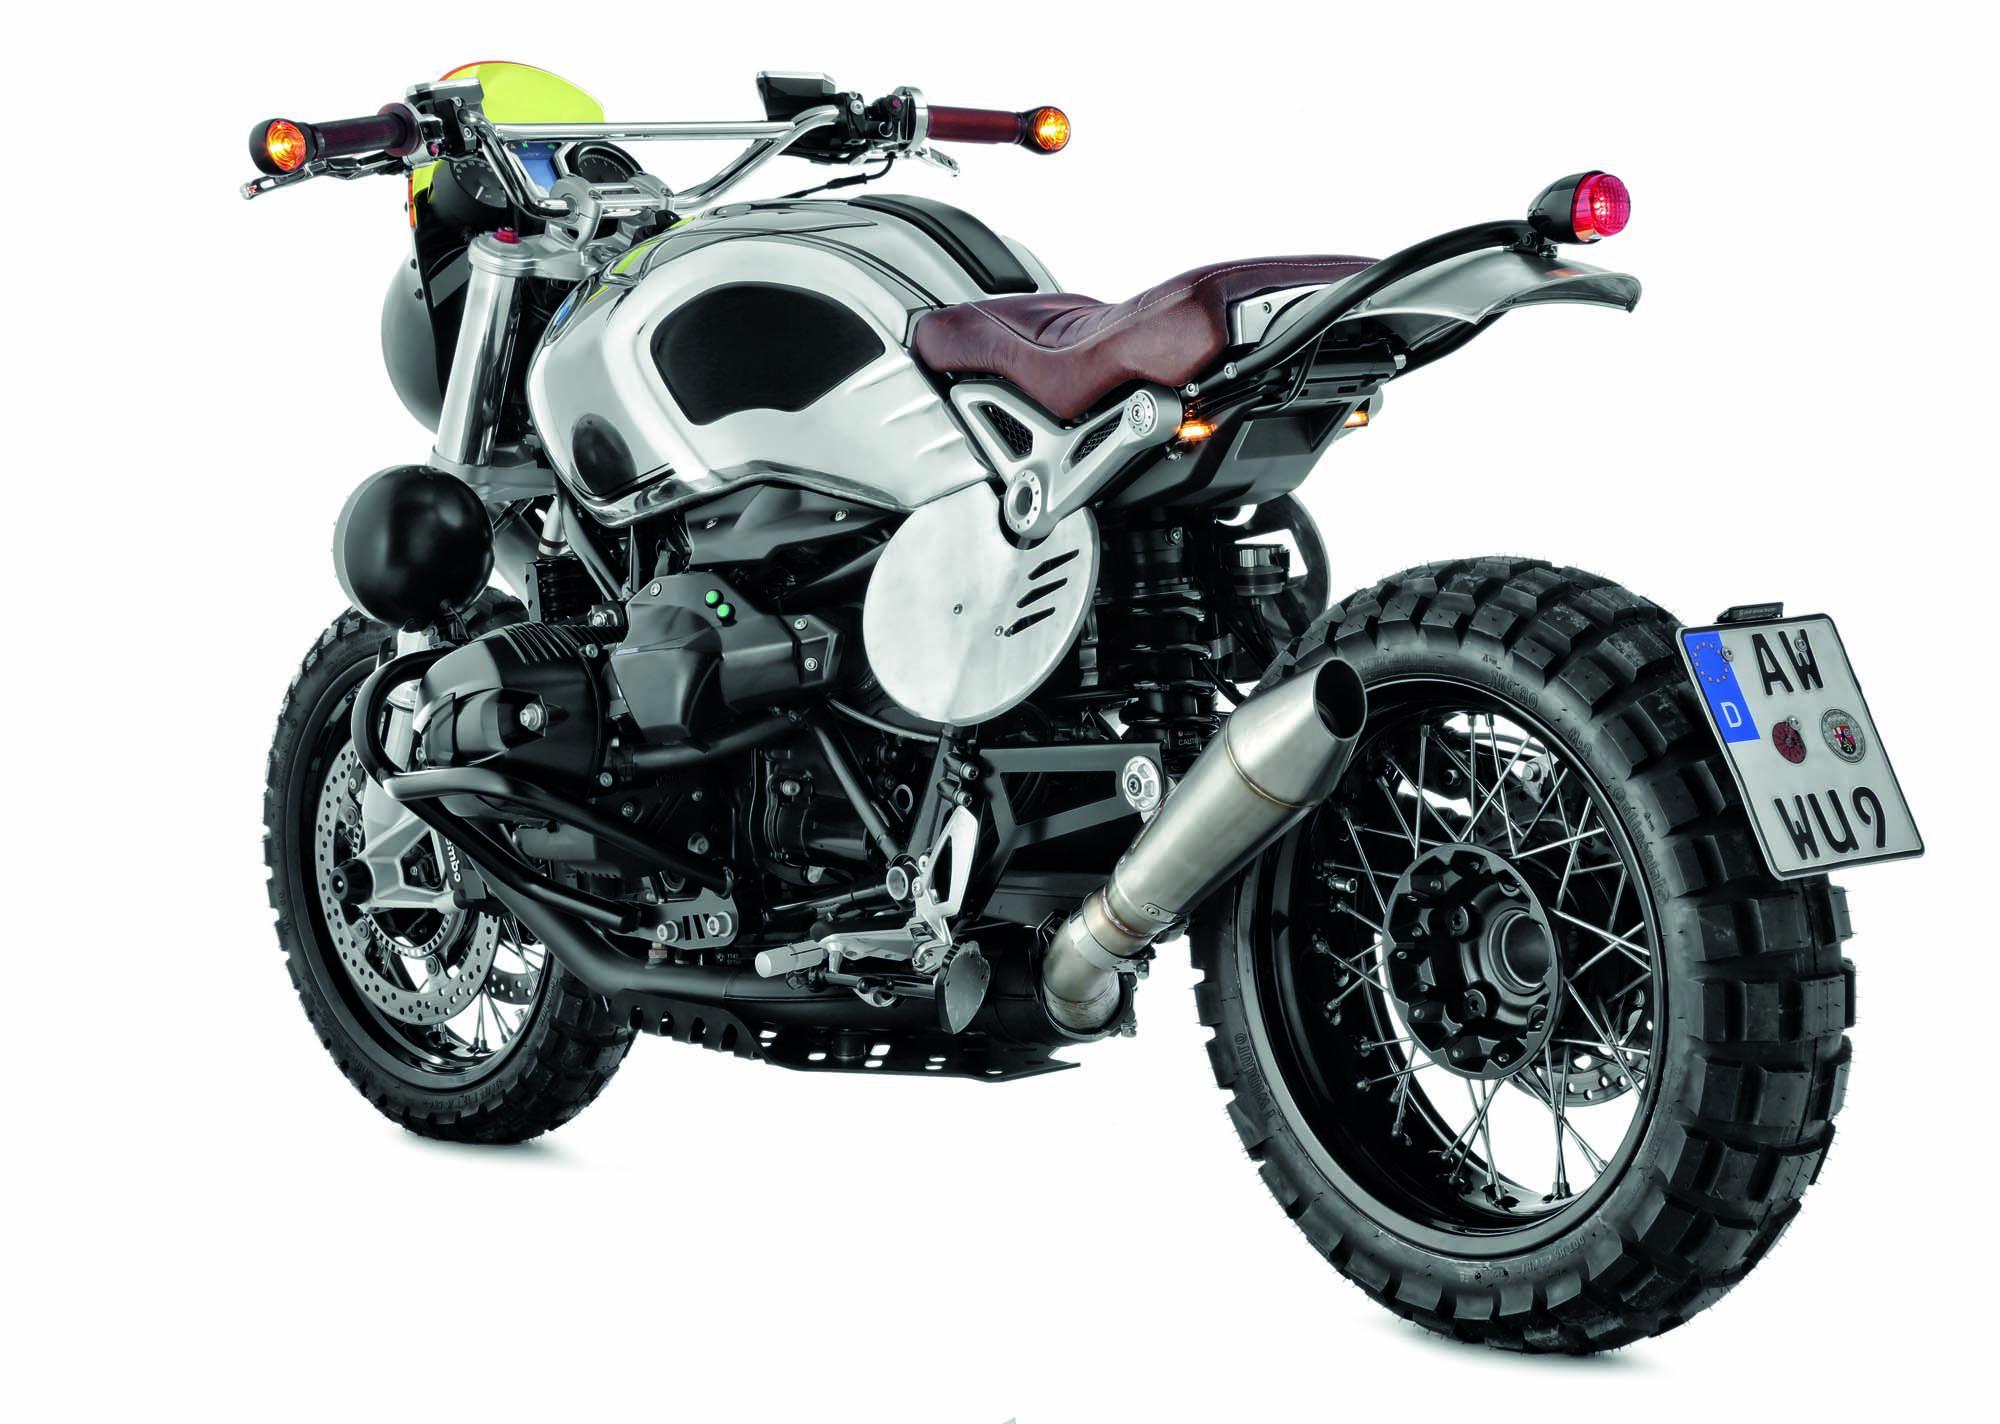 Wunderlich präsentiert den R nineT-Scrambler »Six Days« Motorrad ...